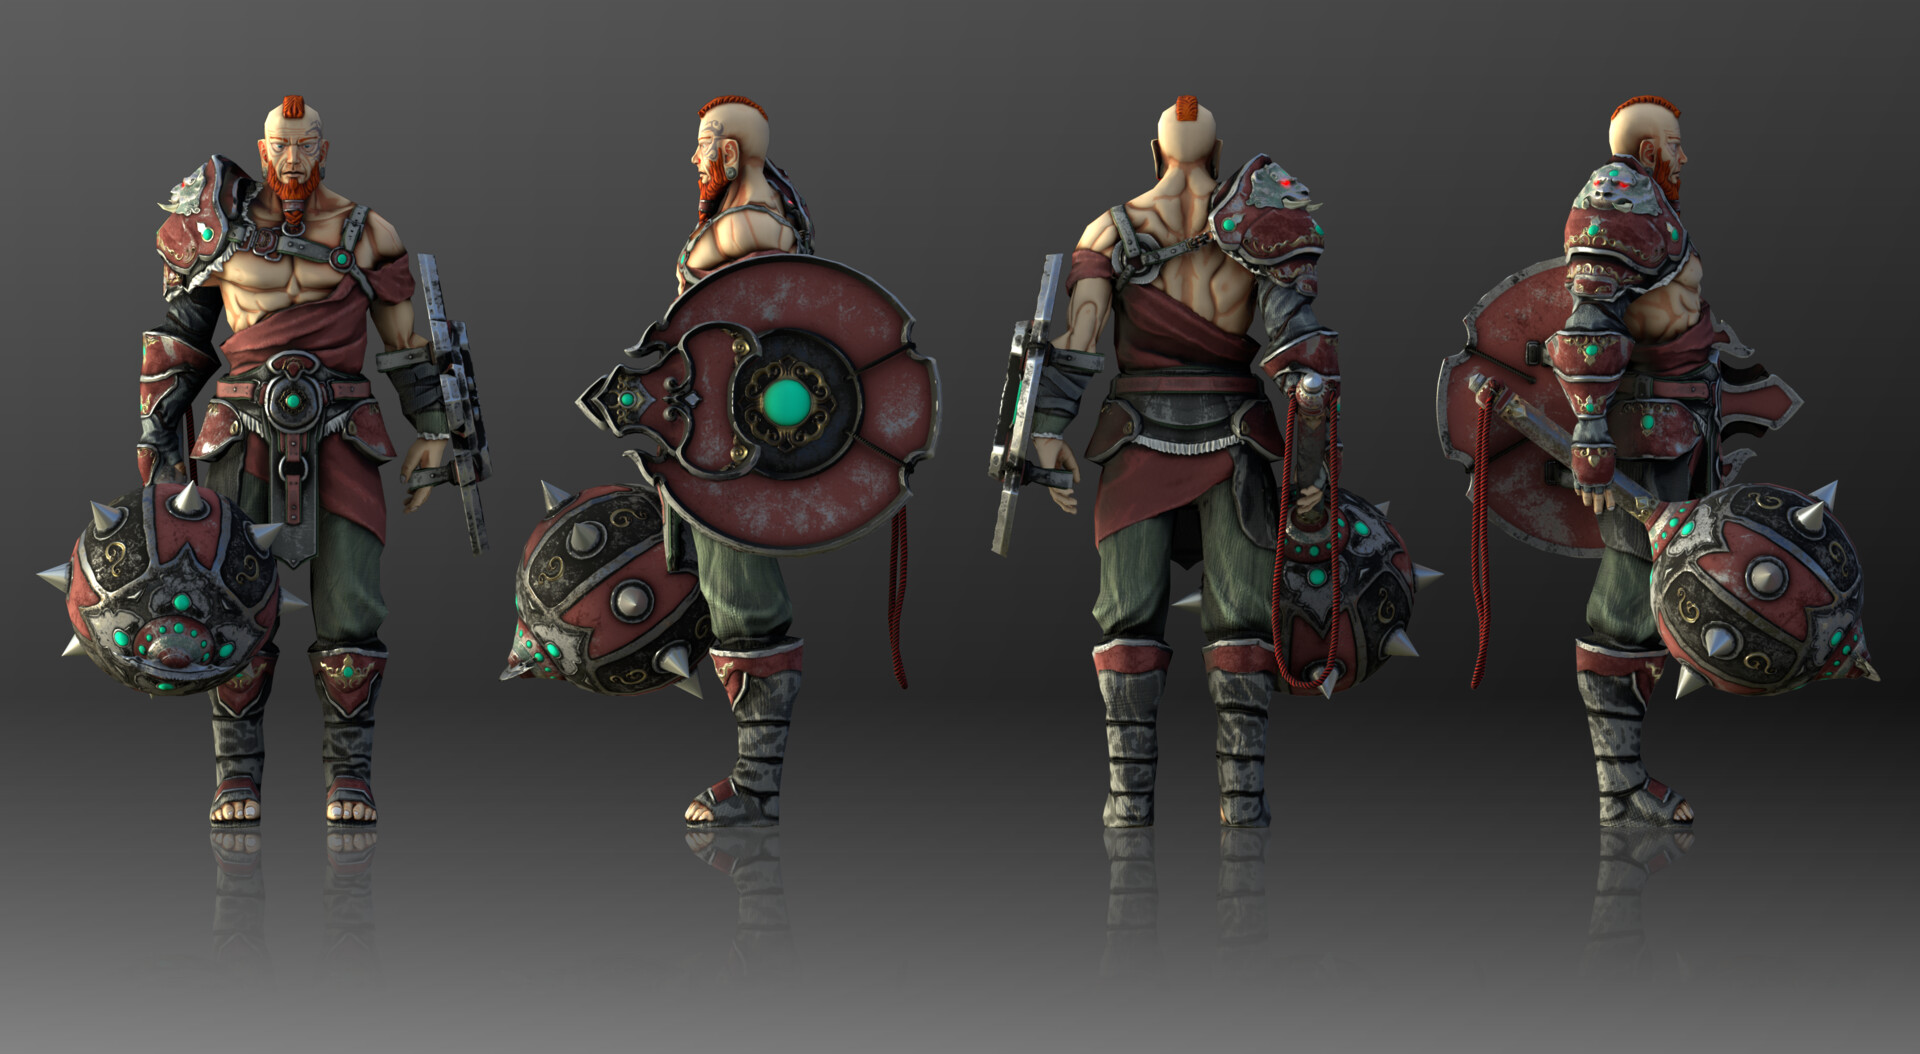 Ulan : Gladiator training tutor.  3D by R.David Presa 2D by Naranbaatar Ganbold